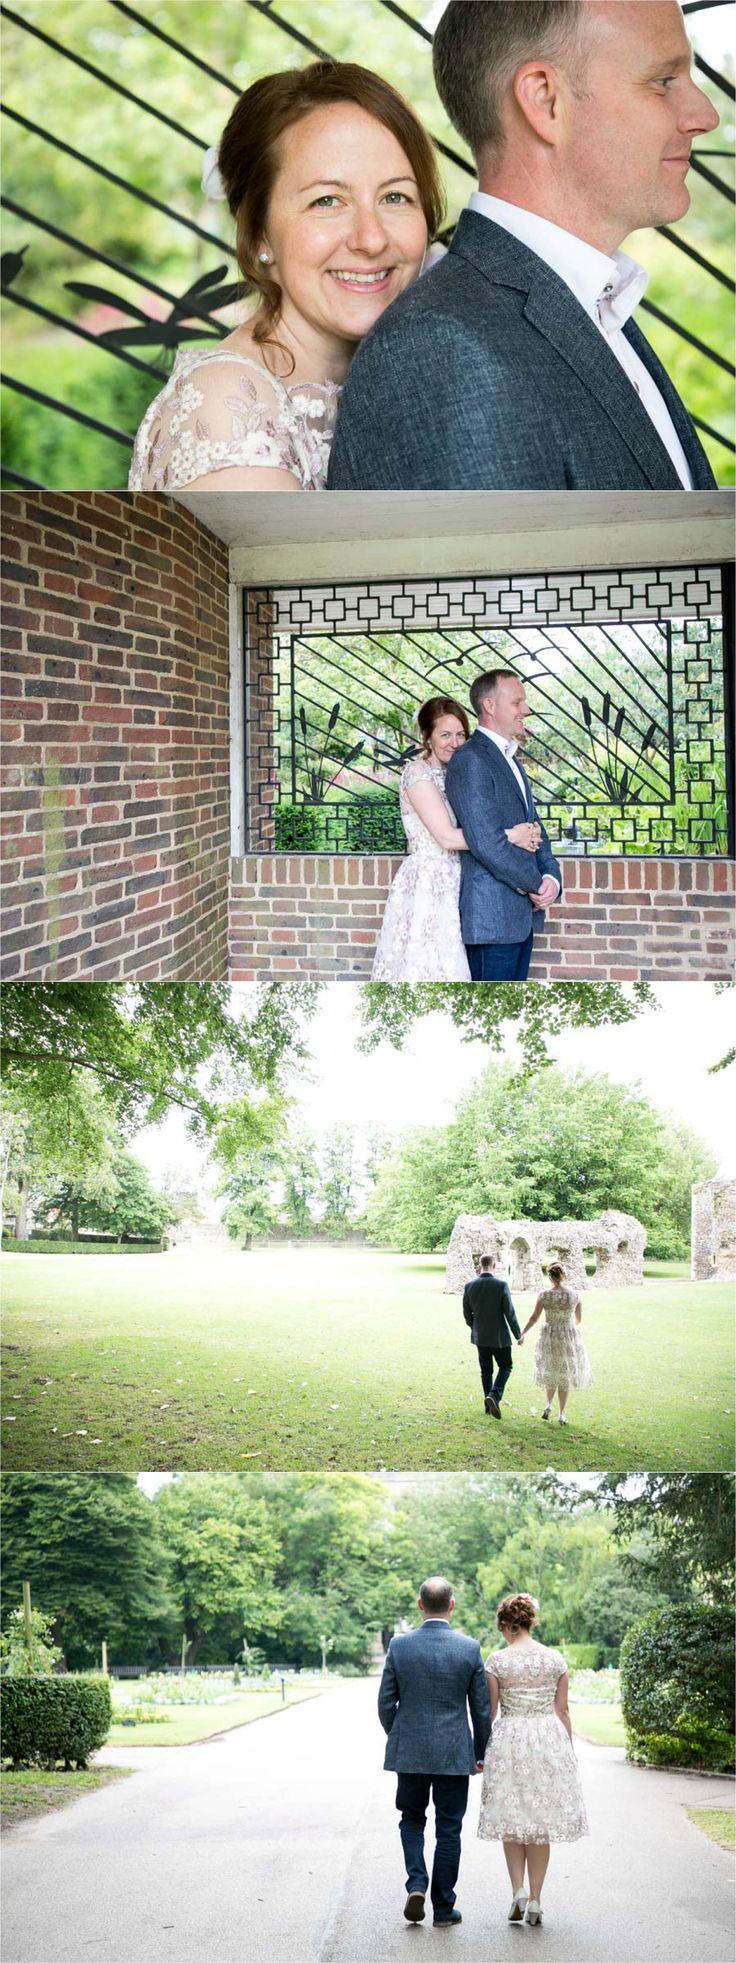 abbey gardens wedding photography, suffolk alternative, fun wedding, intimate wedding, elopemet